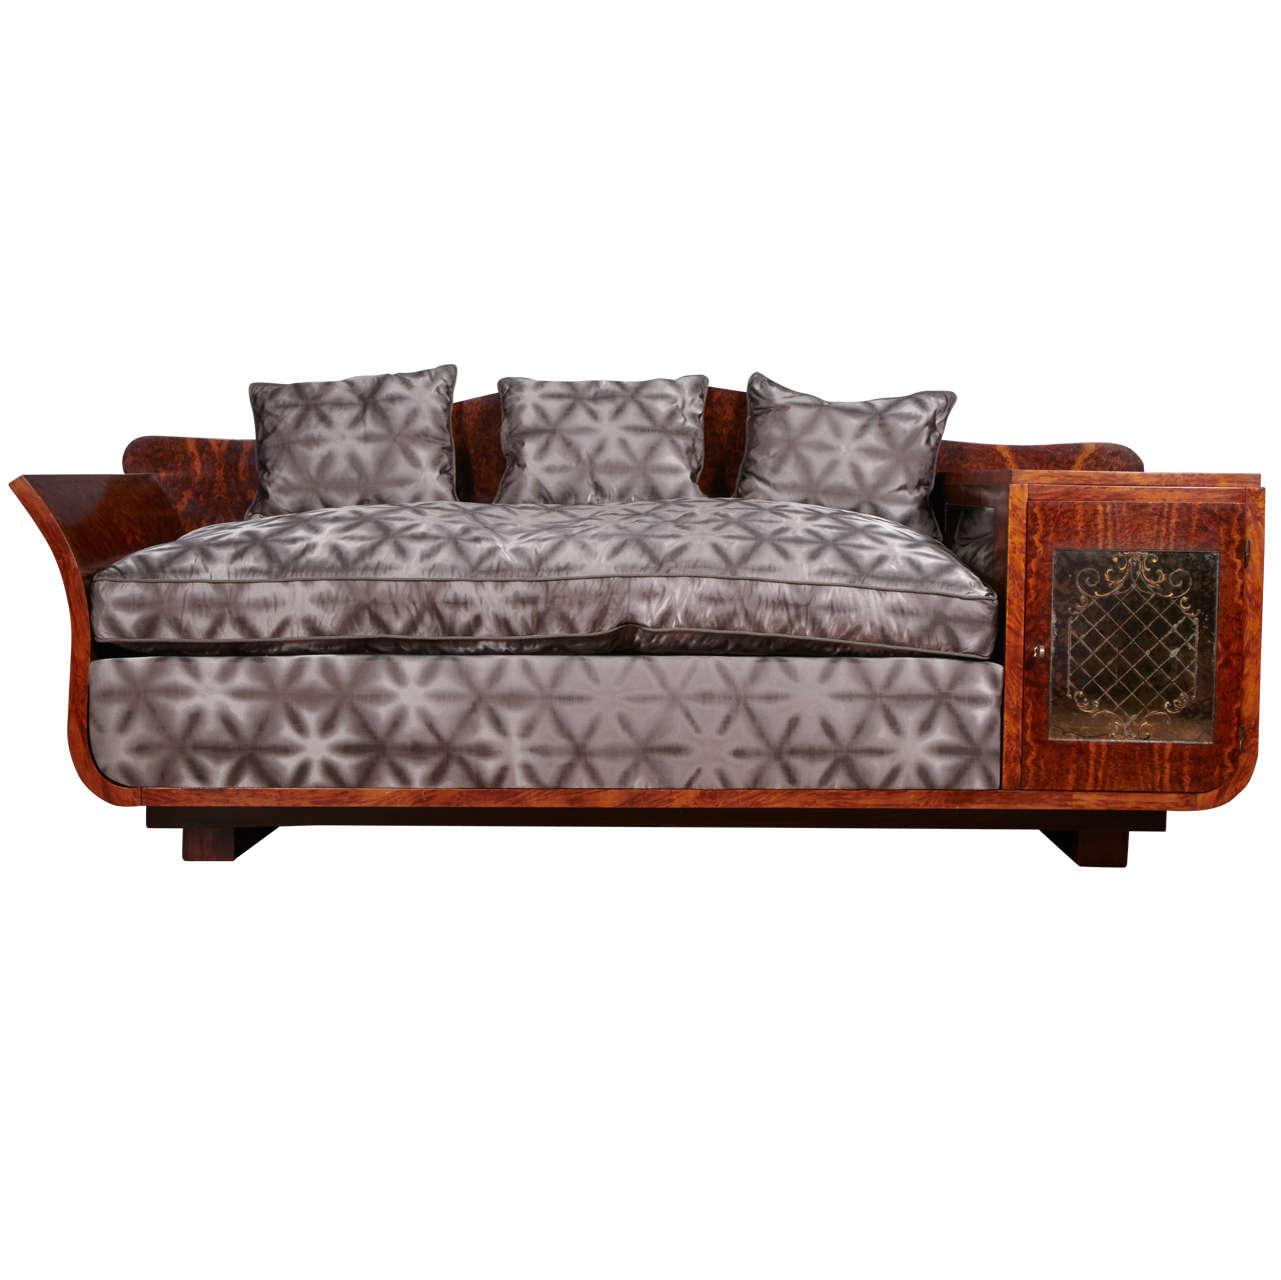 Extraordinary Art Deco sofa